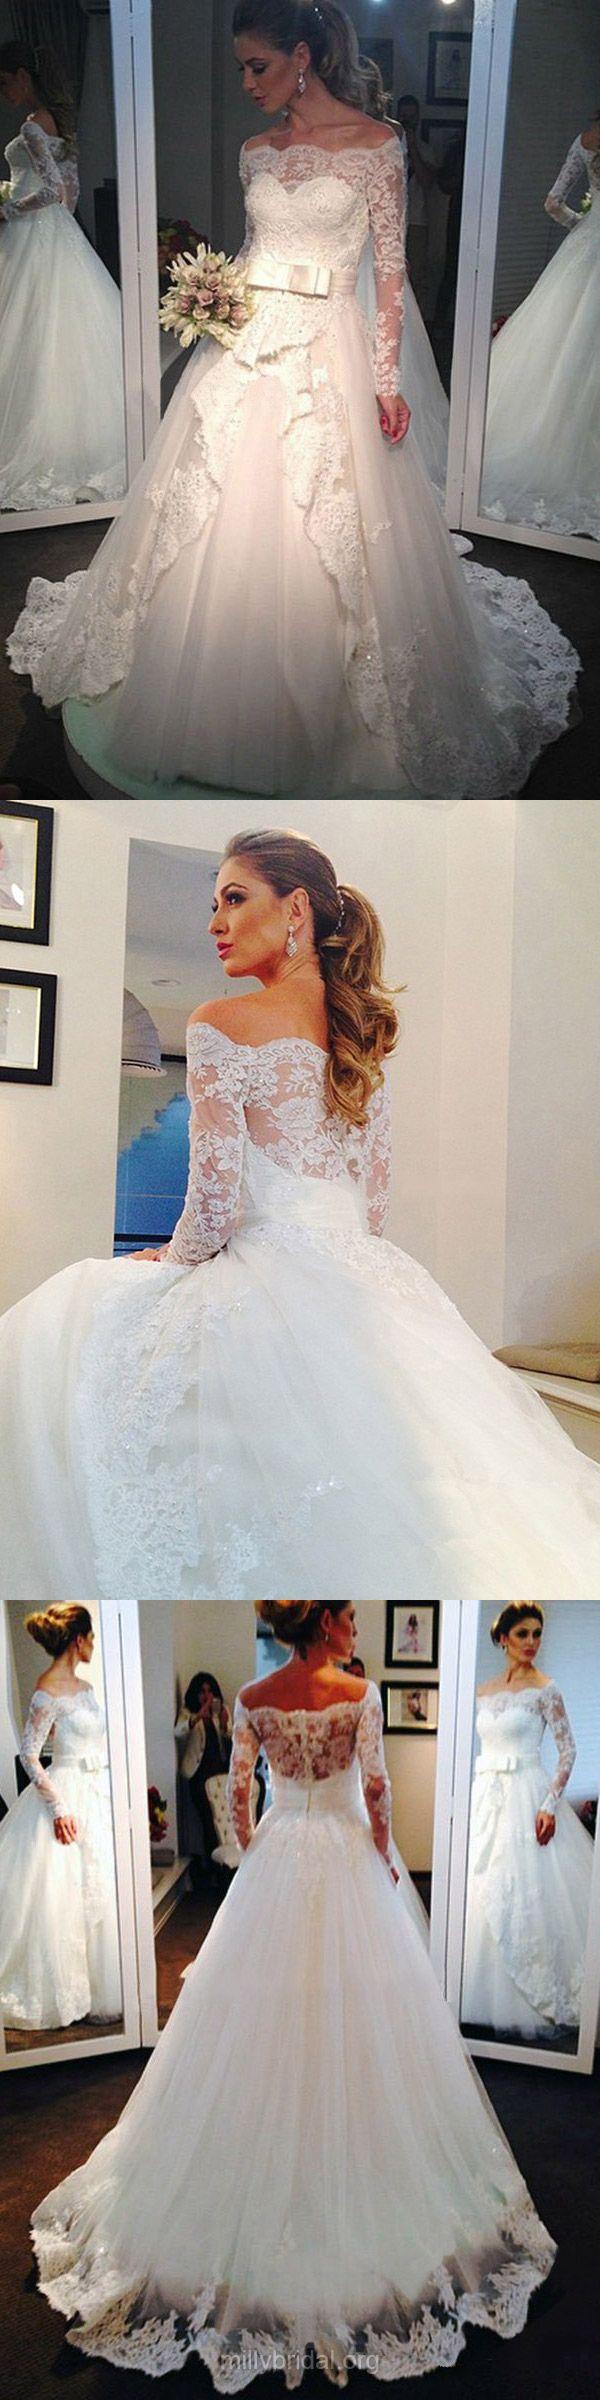 Princess Wedding Dresses Lace, Long Sleeve Bridal Gowns Off-the-shoulder, Modest Wedding Dress Cheap